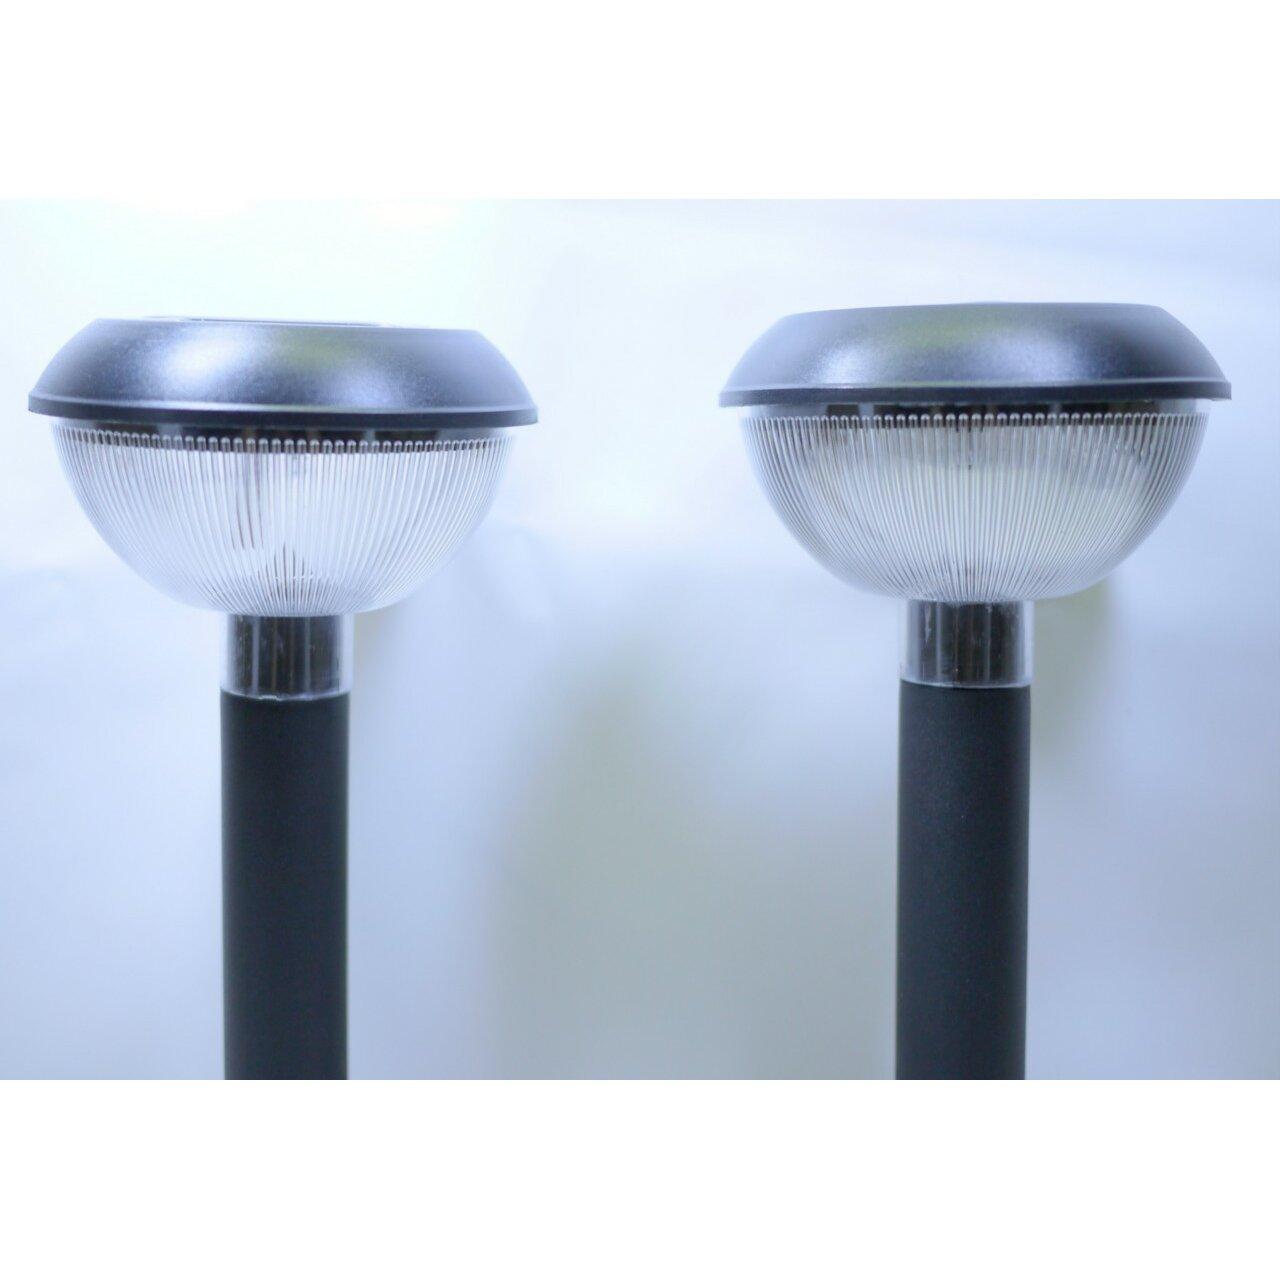 Landscape Lighting Kit Solar Powered Walkway Lights: Homebrite Solar Solar 12 Light Pathway Light Kit & Reviews